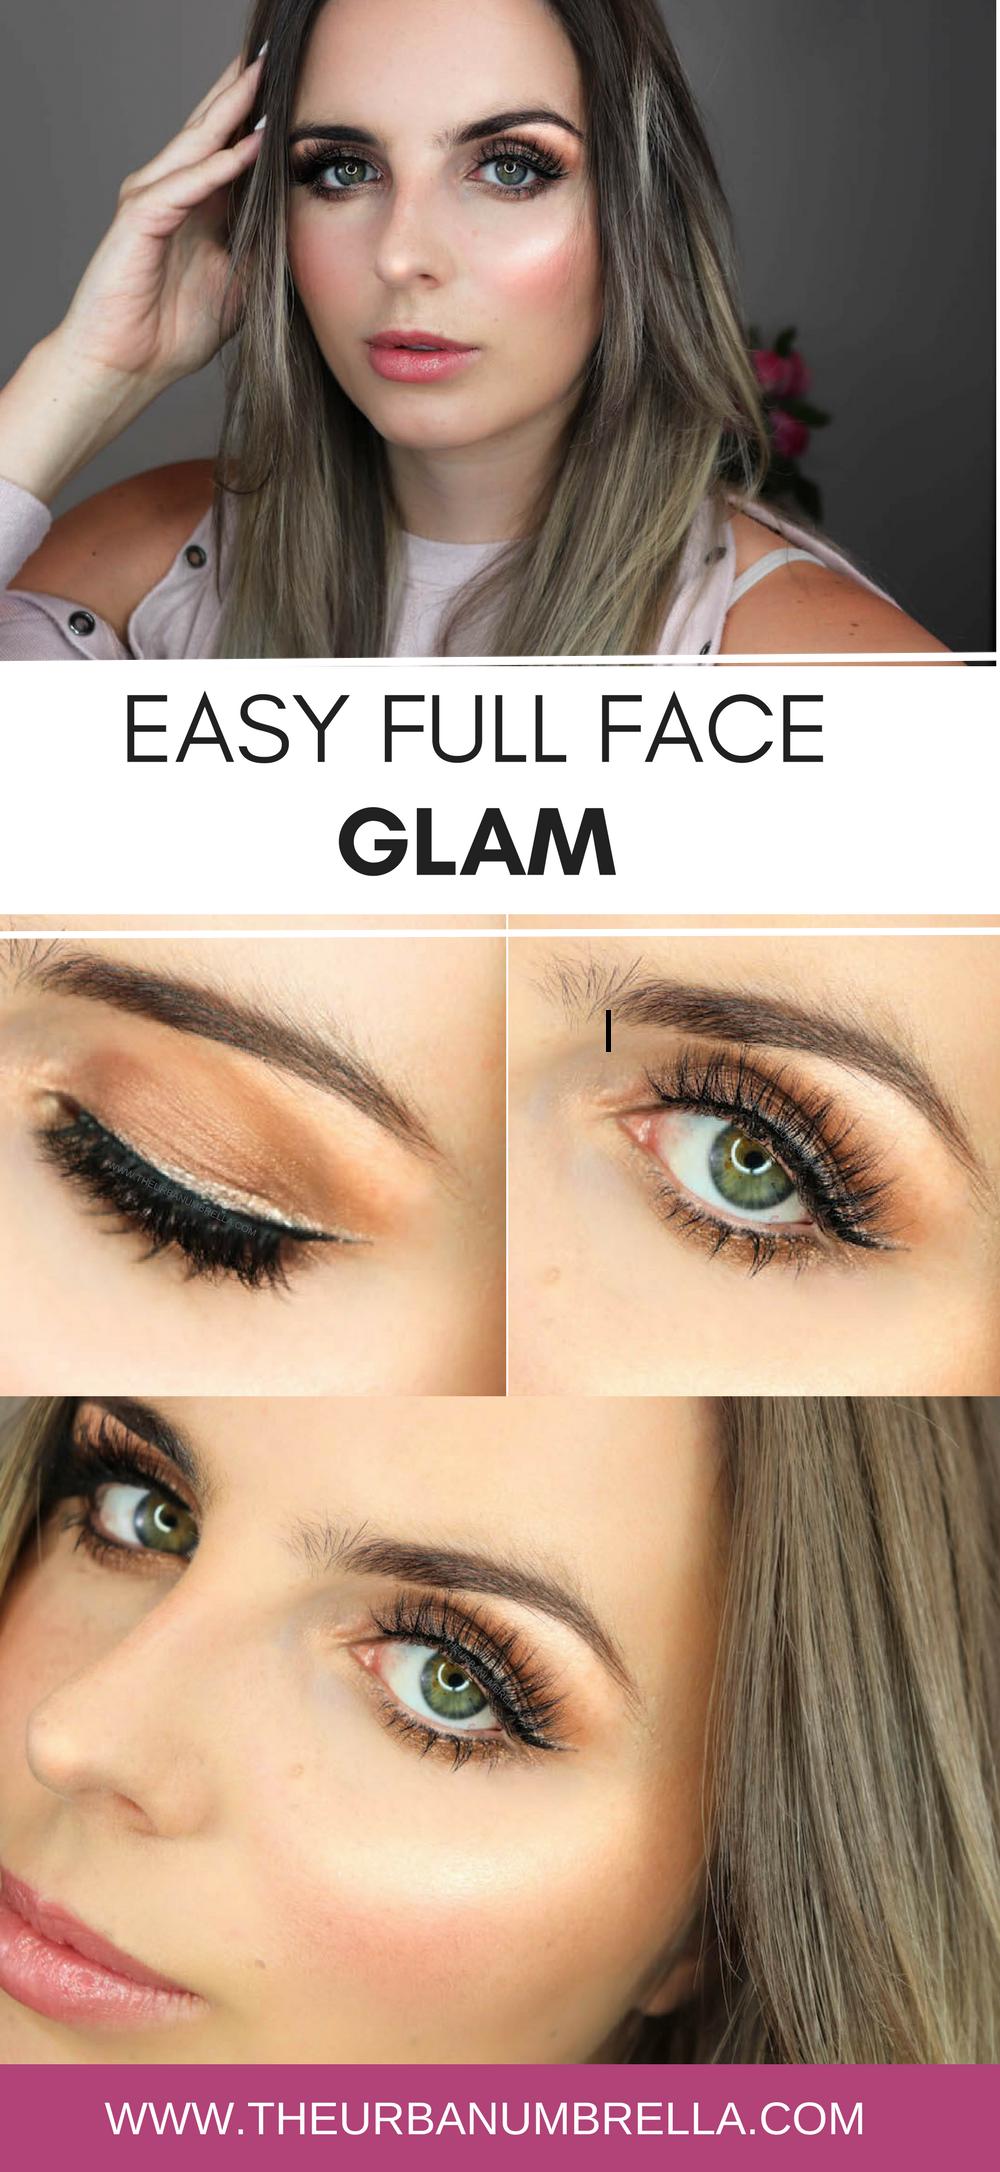 Full Face Glam Makeup Tutorial Glam makeup, Beauty hacks